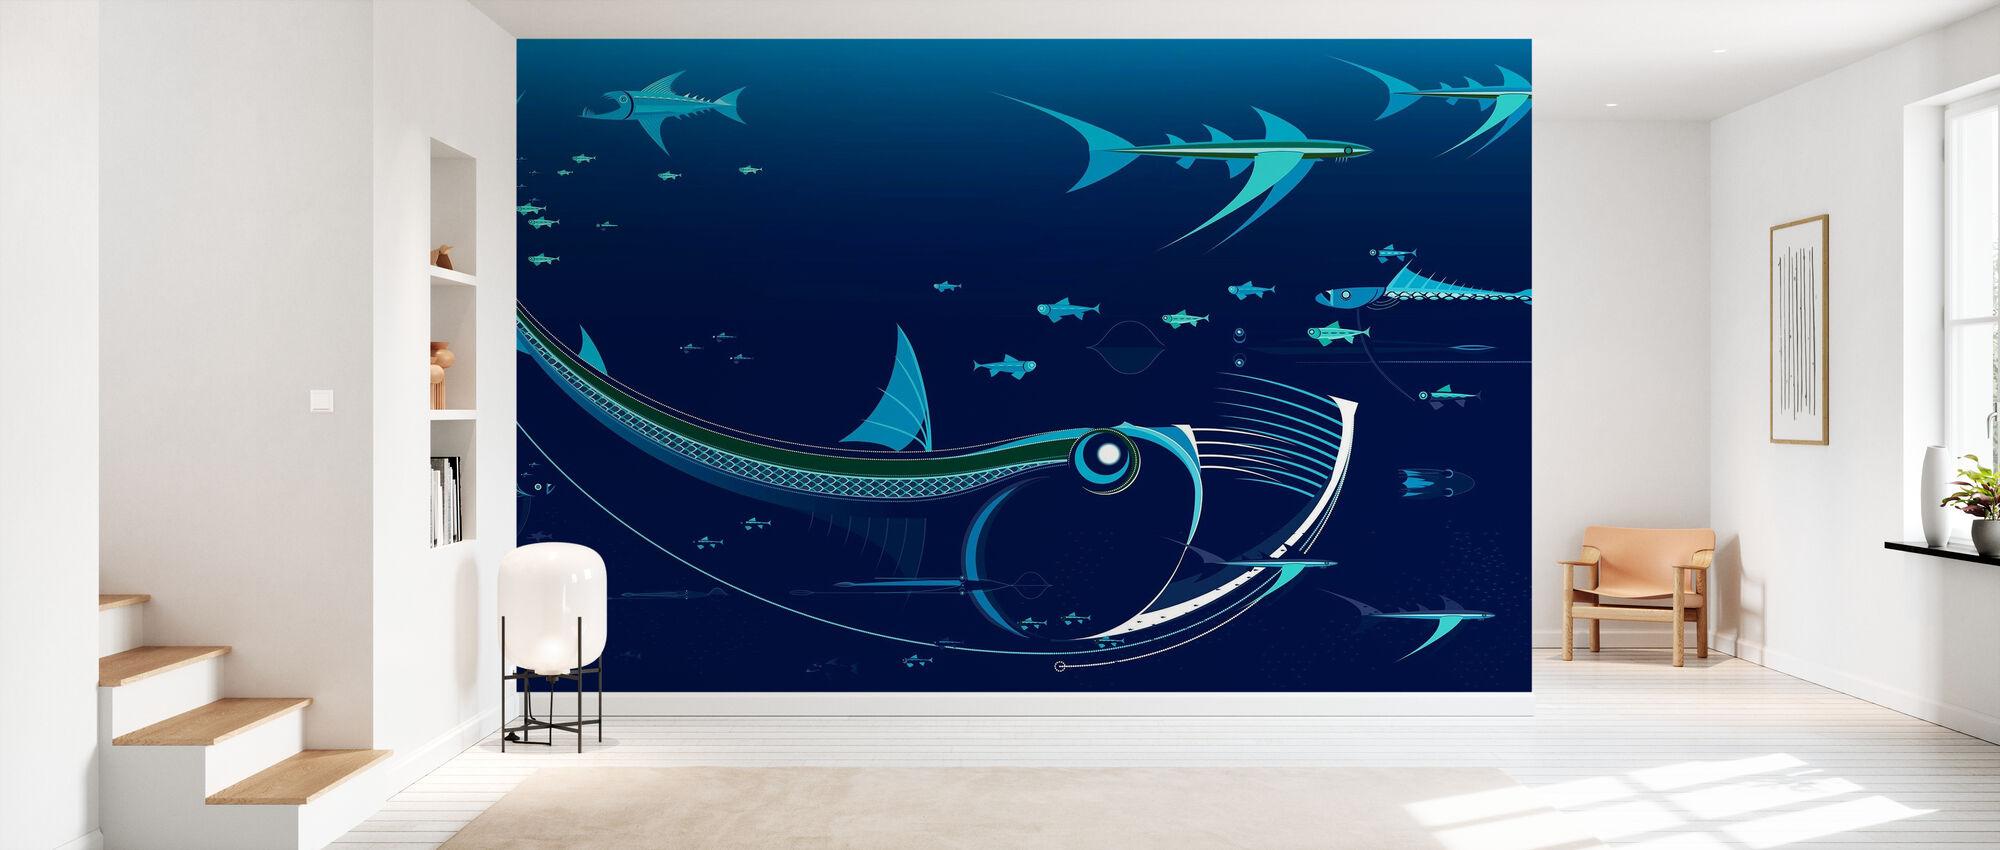 Northmix Blue - Wallpaper - Hallway